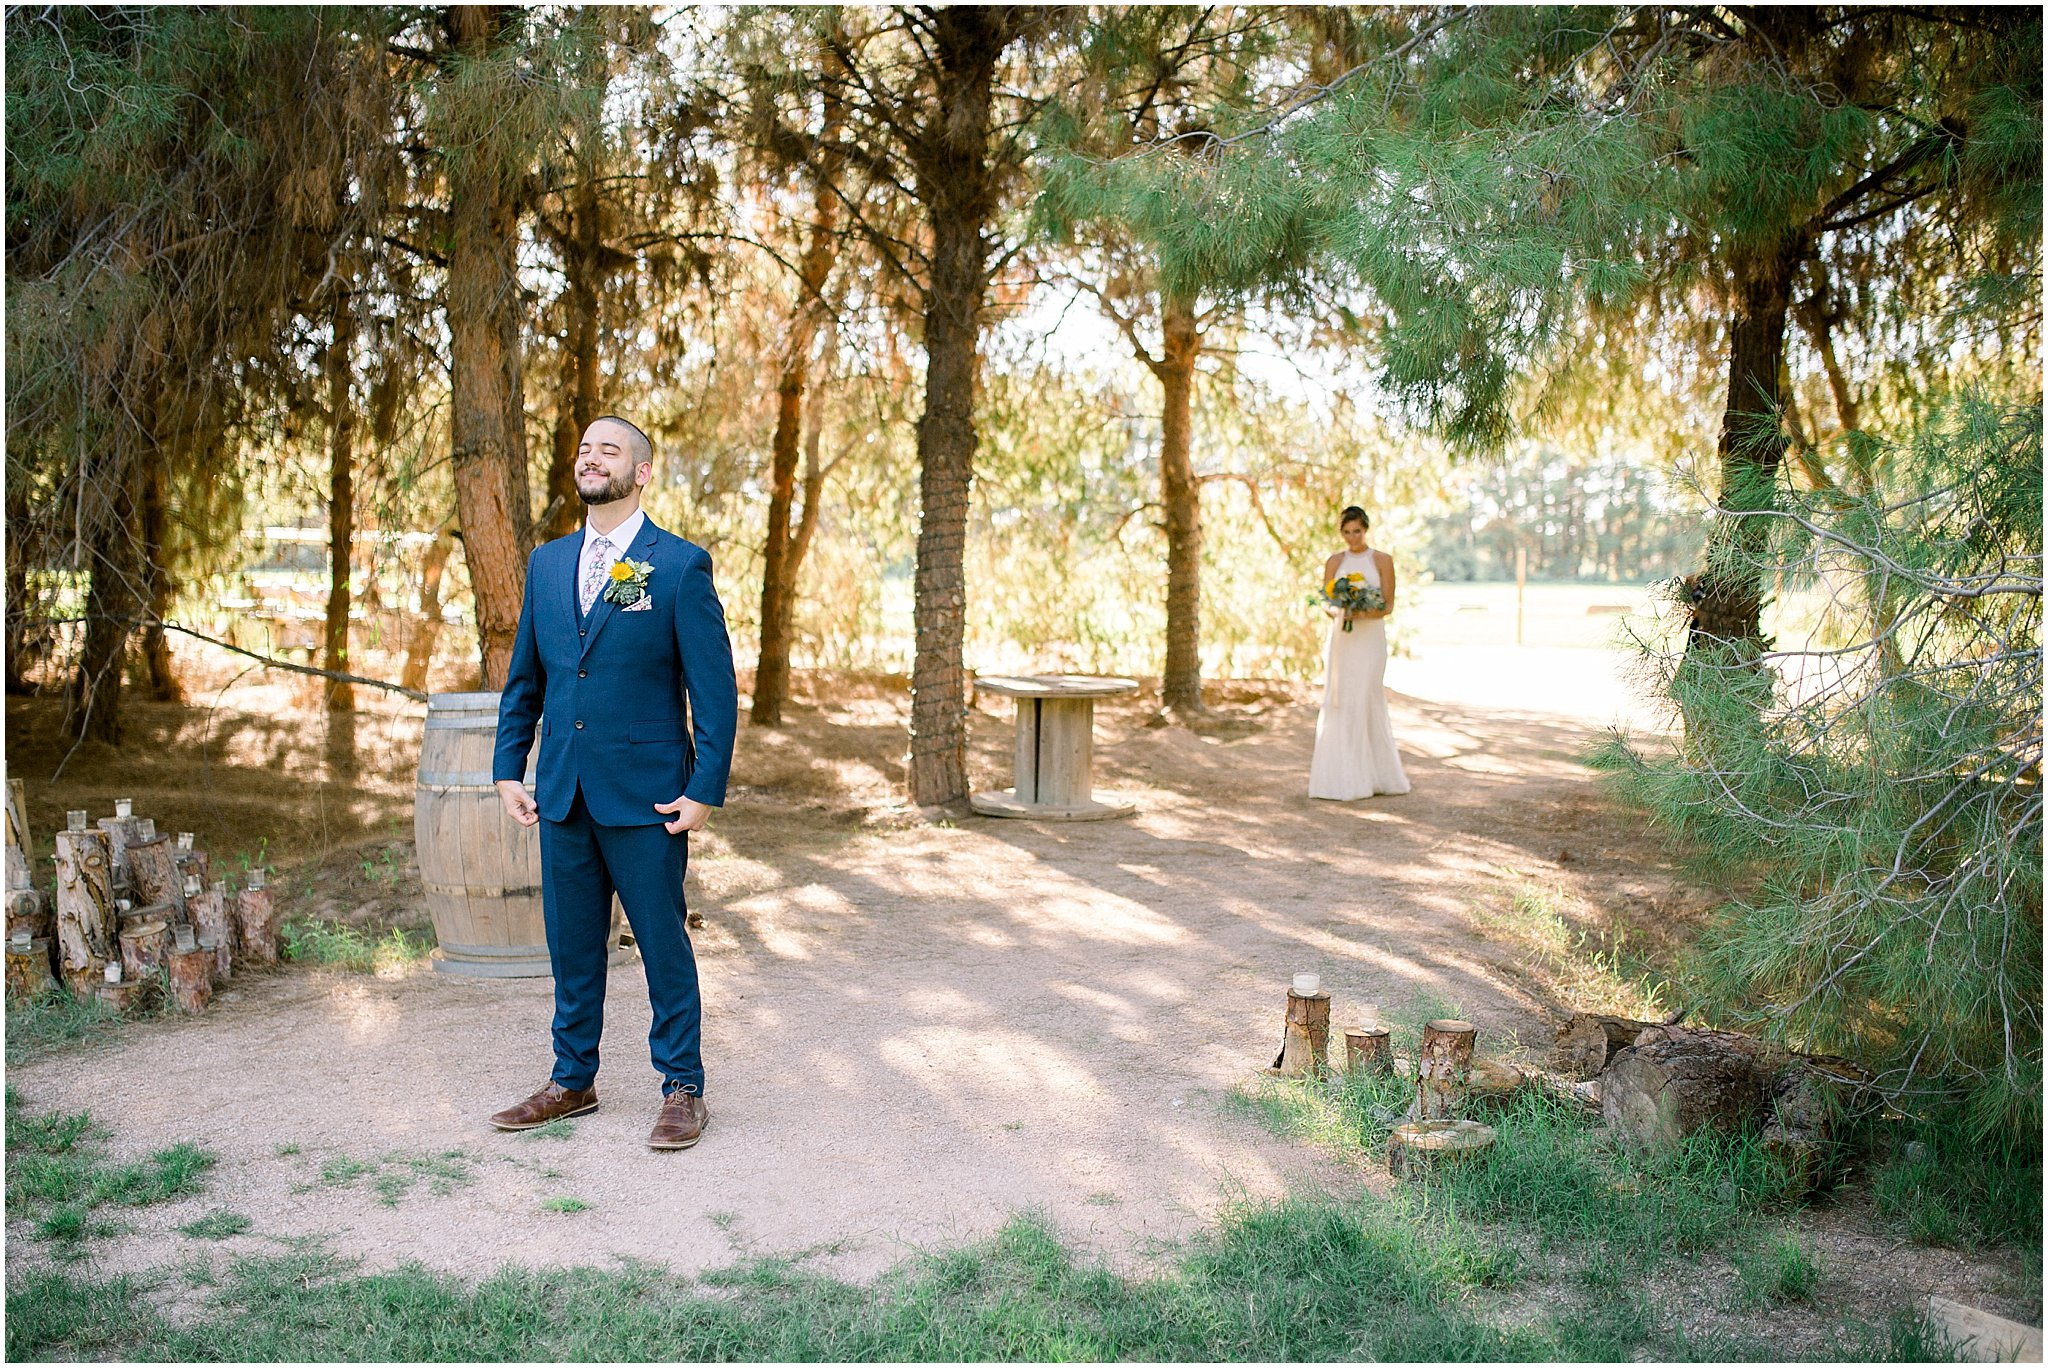 Hyatt-Lodge-Mcdonald-Campus-Wedding_0093.jpg